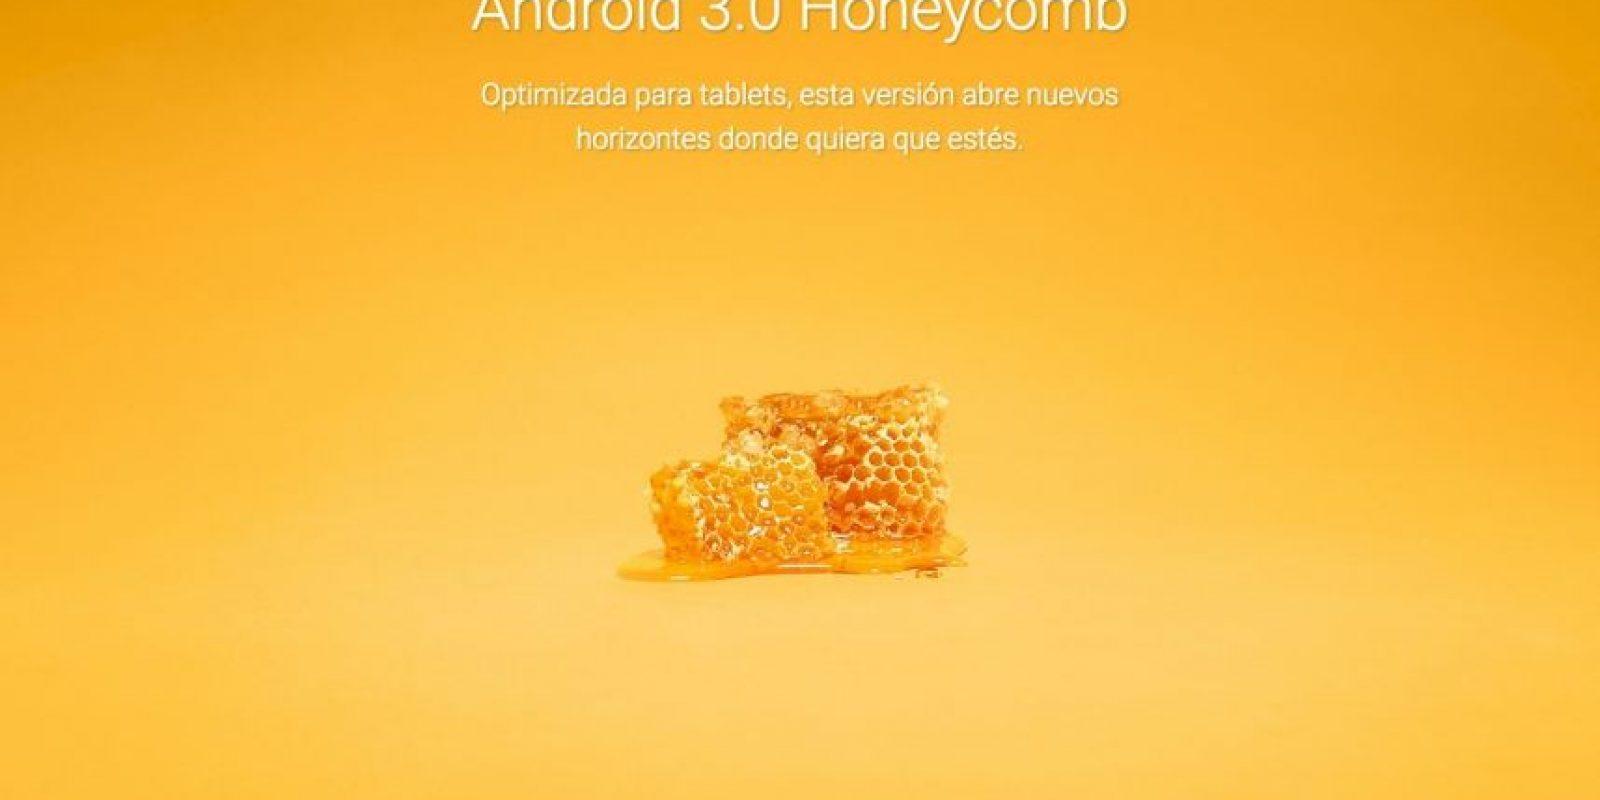 Android 3.0 Honeycomb Foto:Google